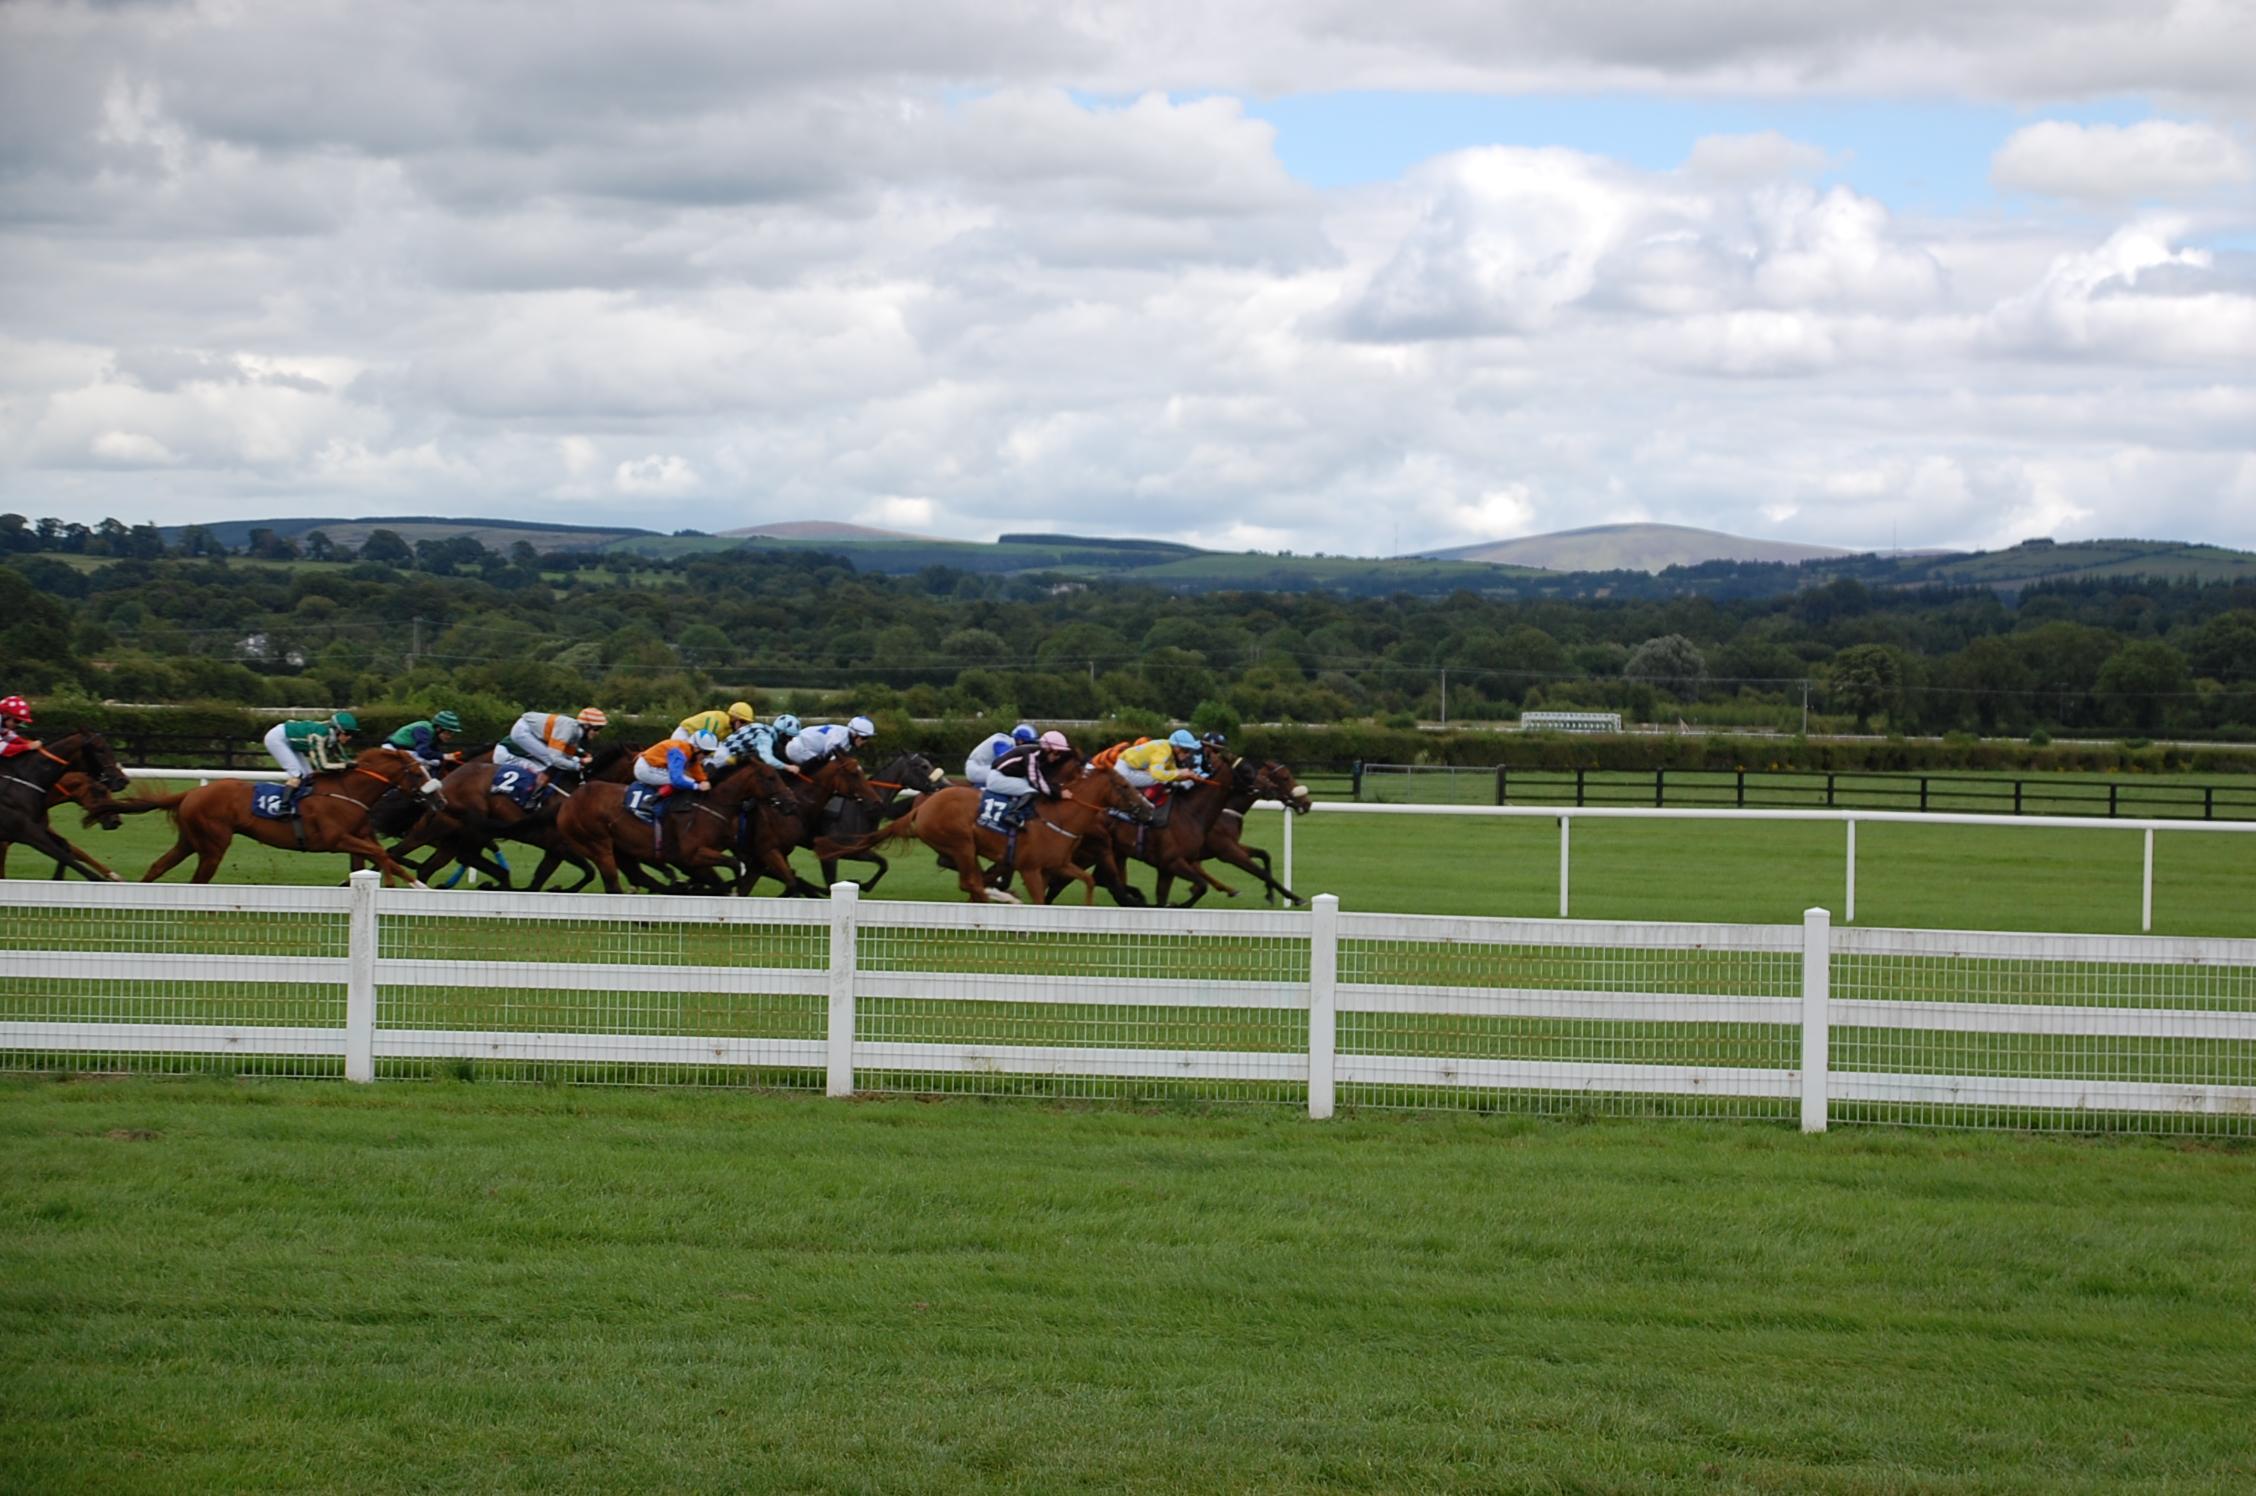 Ascot and Lingfield Saturday Tips by Dave Stevos